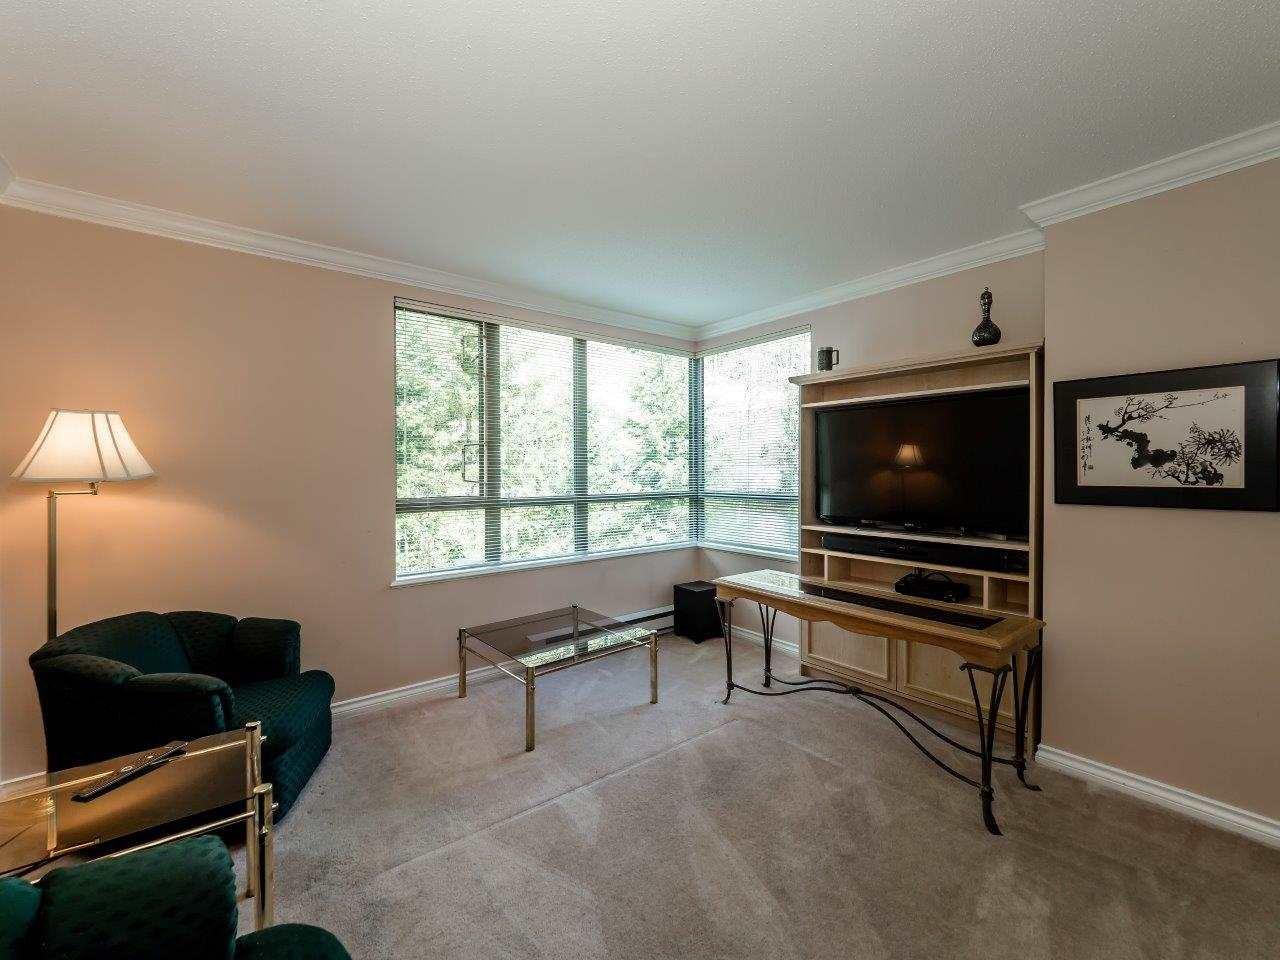 Photo 8: Photos: 702 3105 DEER RIDGE DRIVE in West Vancouver: Deer Ridge WV Condo for sale : MLS®# R2053638